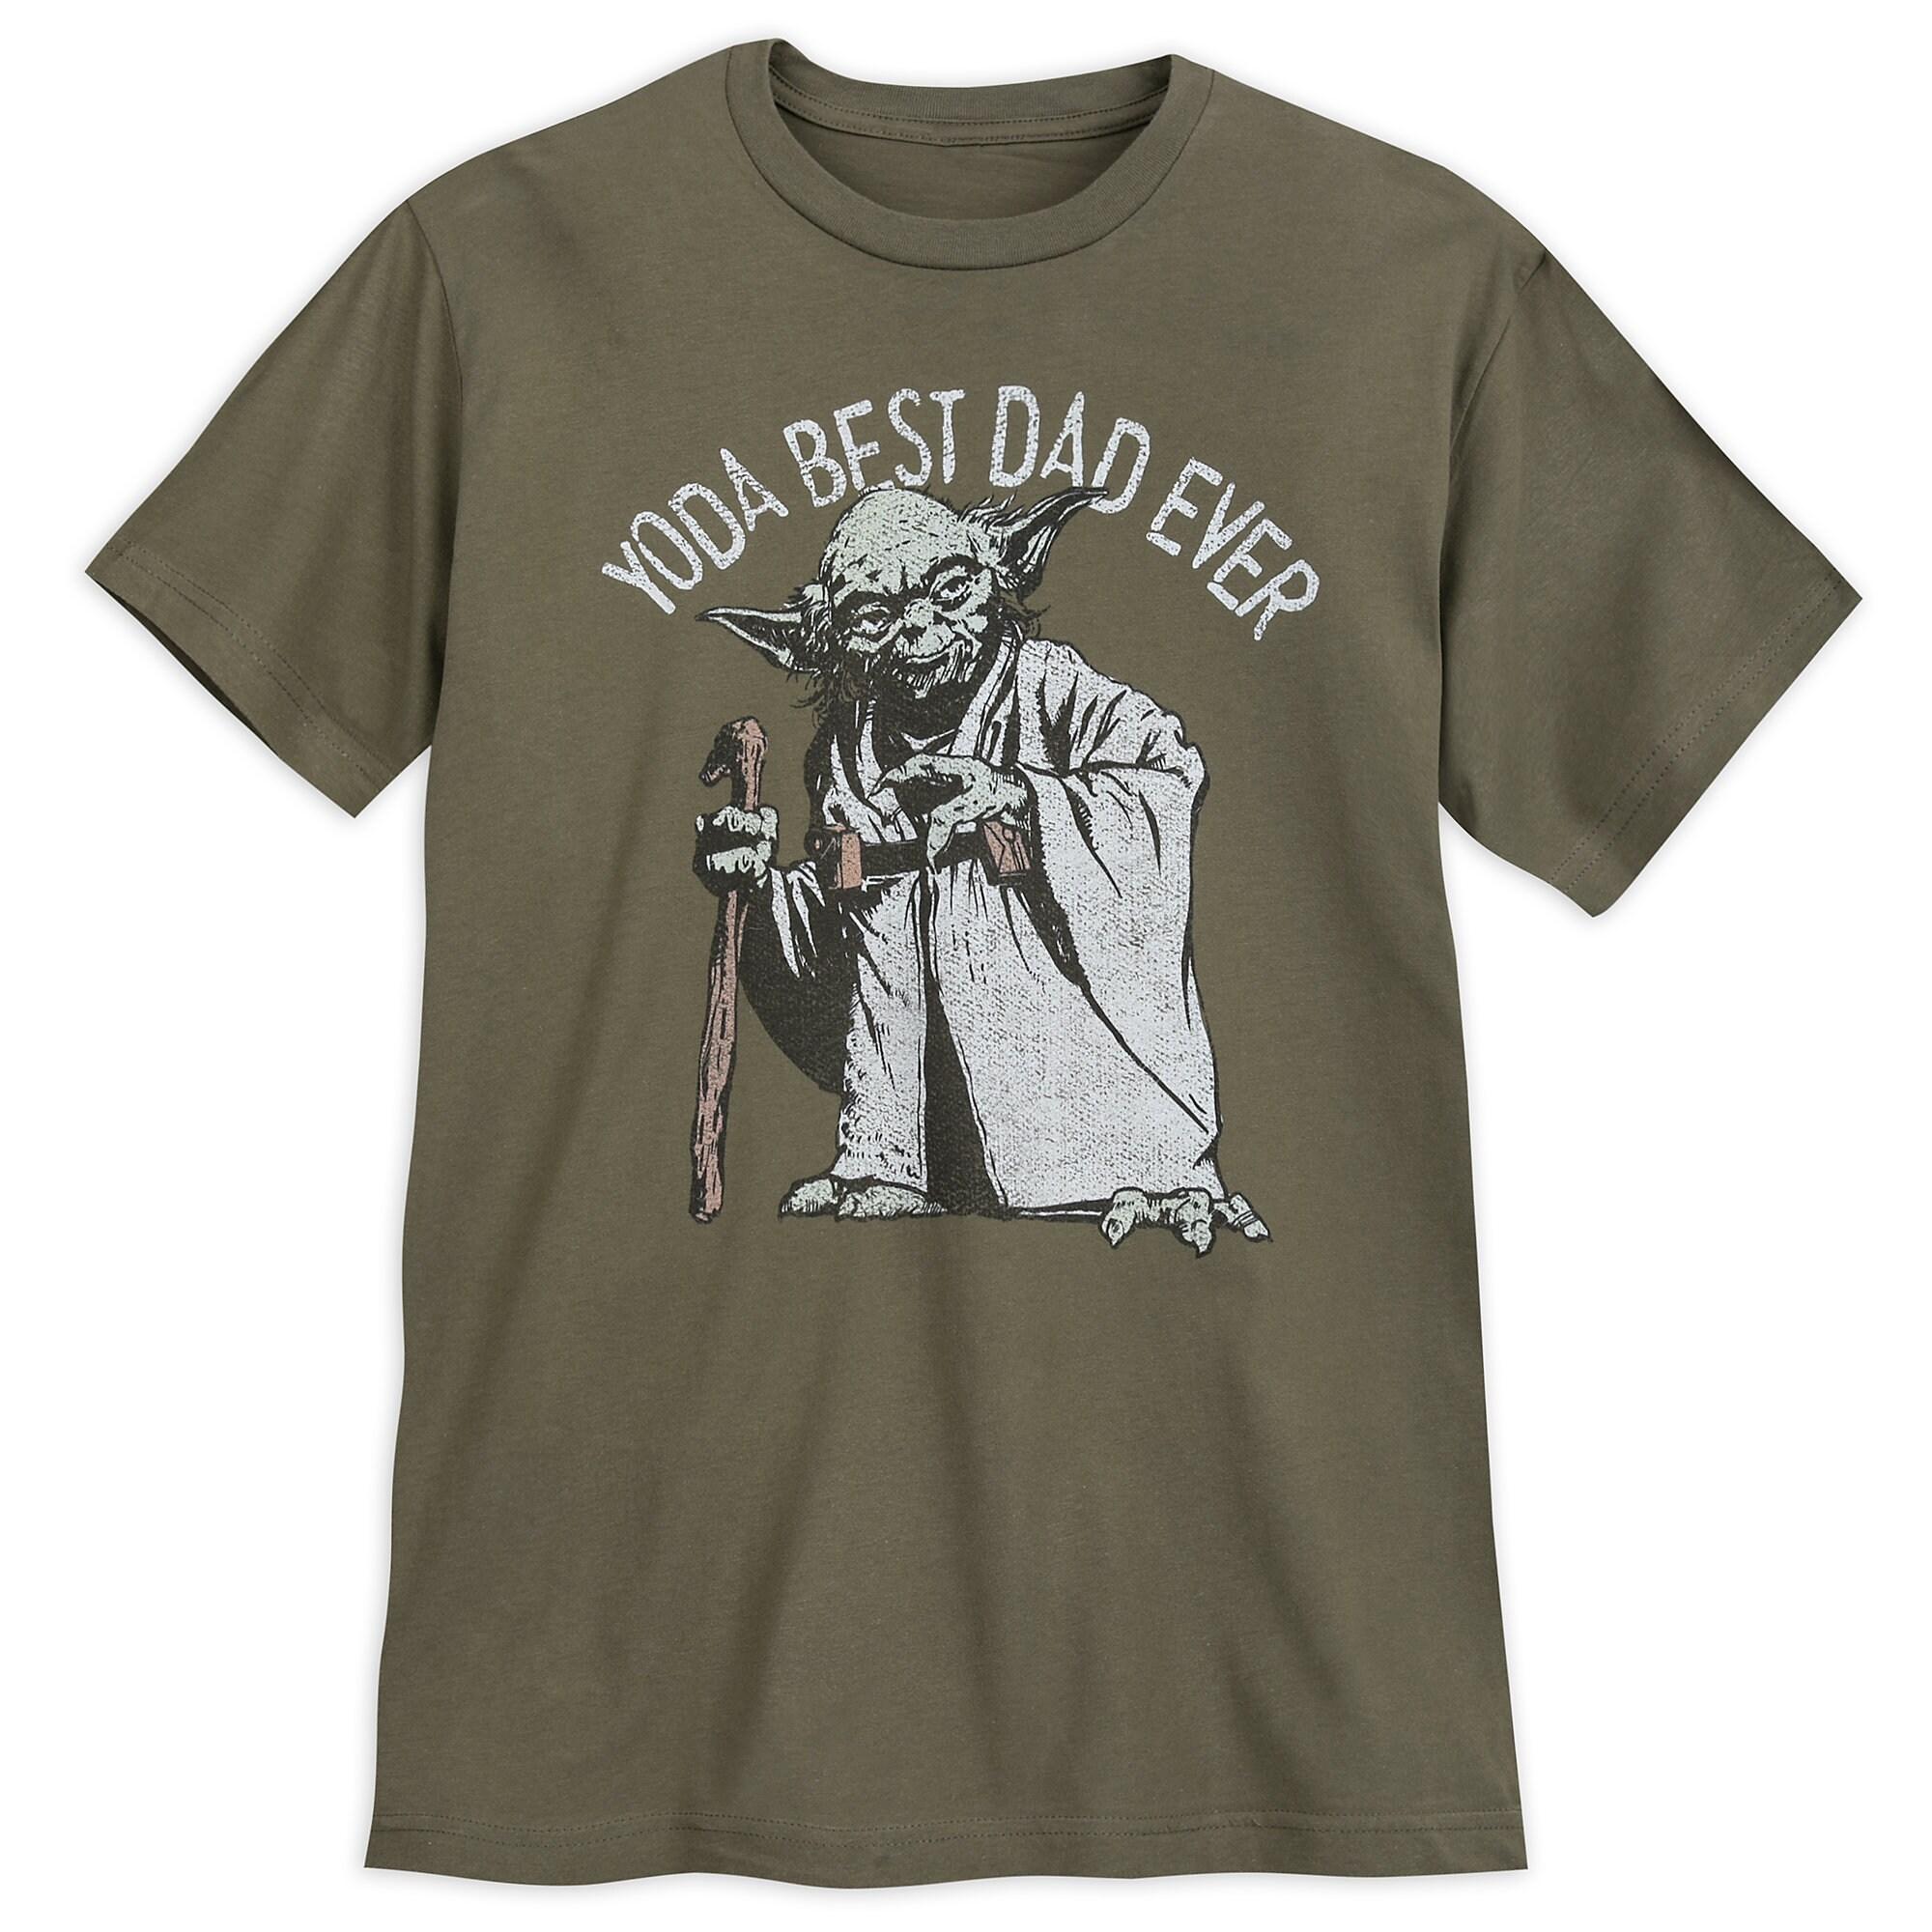 c25bcf130 Yoda ''Best Dad Ever'' T-Shirt for Men - Star Wars | shopDisney